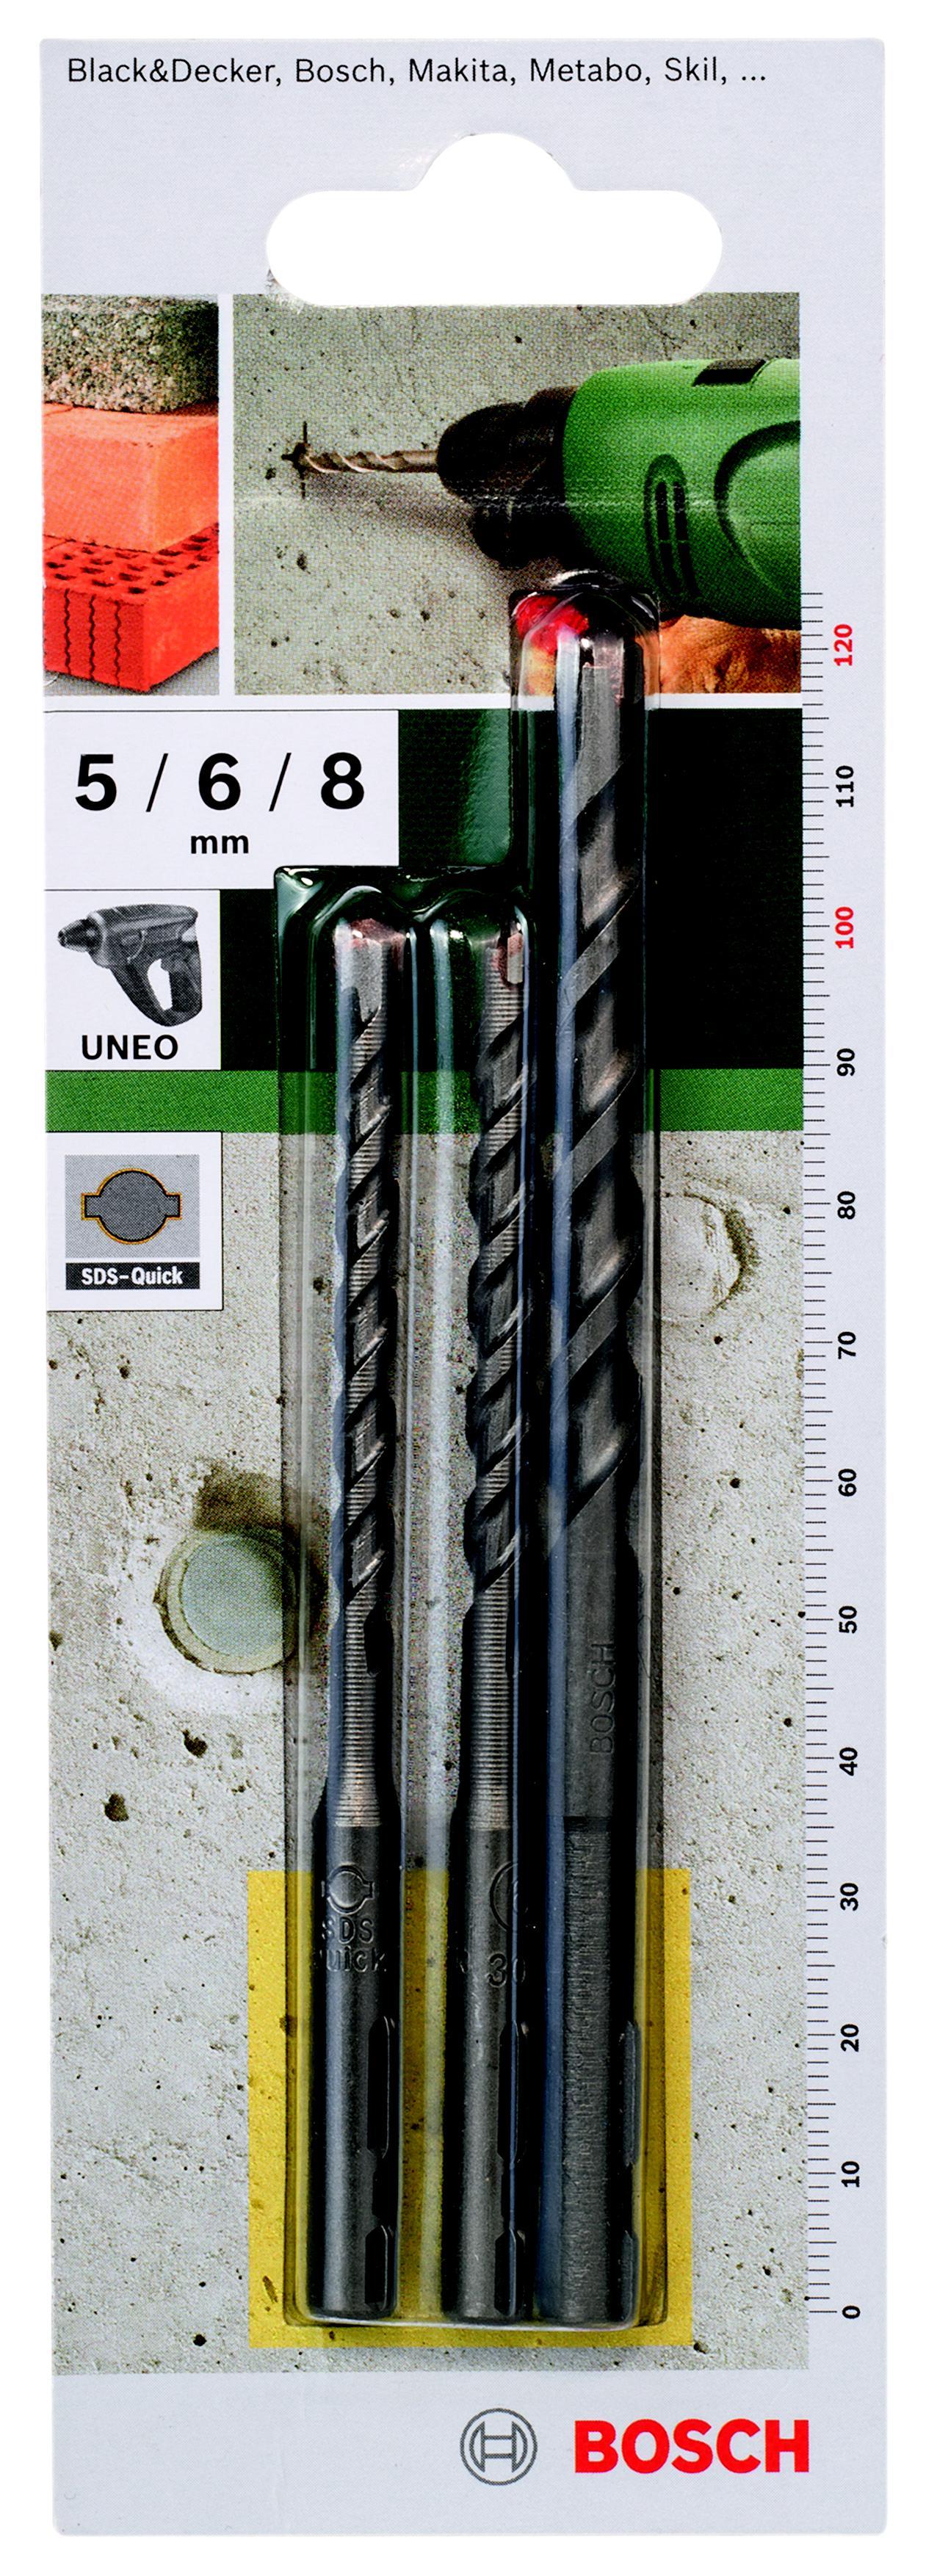 Набор сверл Bosch 2 609 256 908 по бетону, для uneo bosch 20х250мм 2 609 390 394